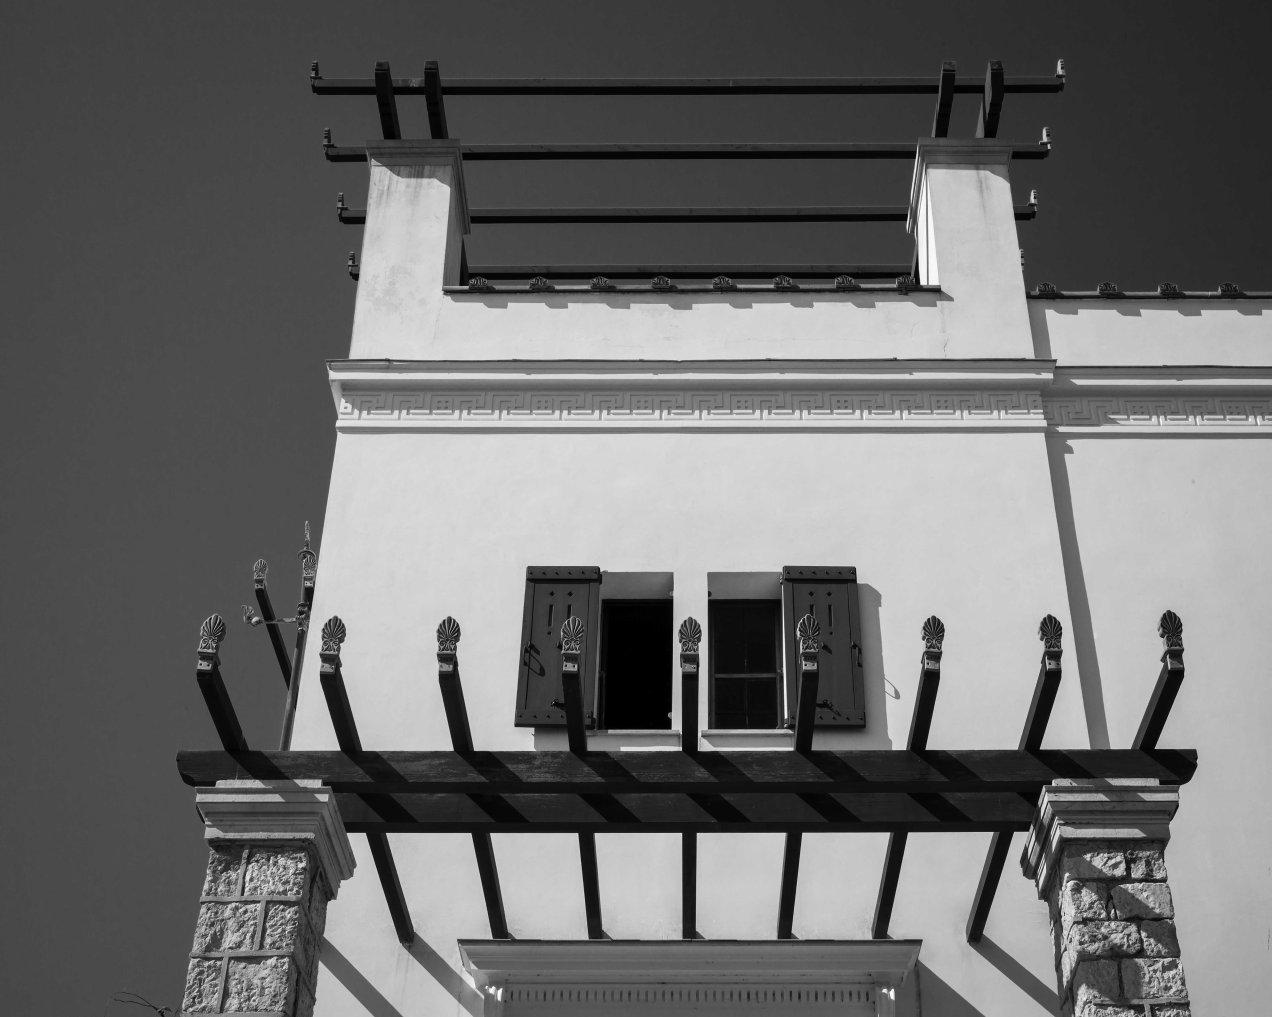 terrasse, Kérylos, gildalliere, 2017-Modifier.jpg